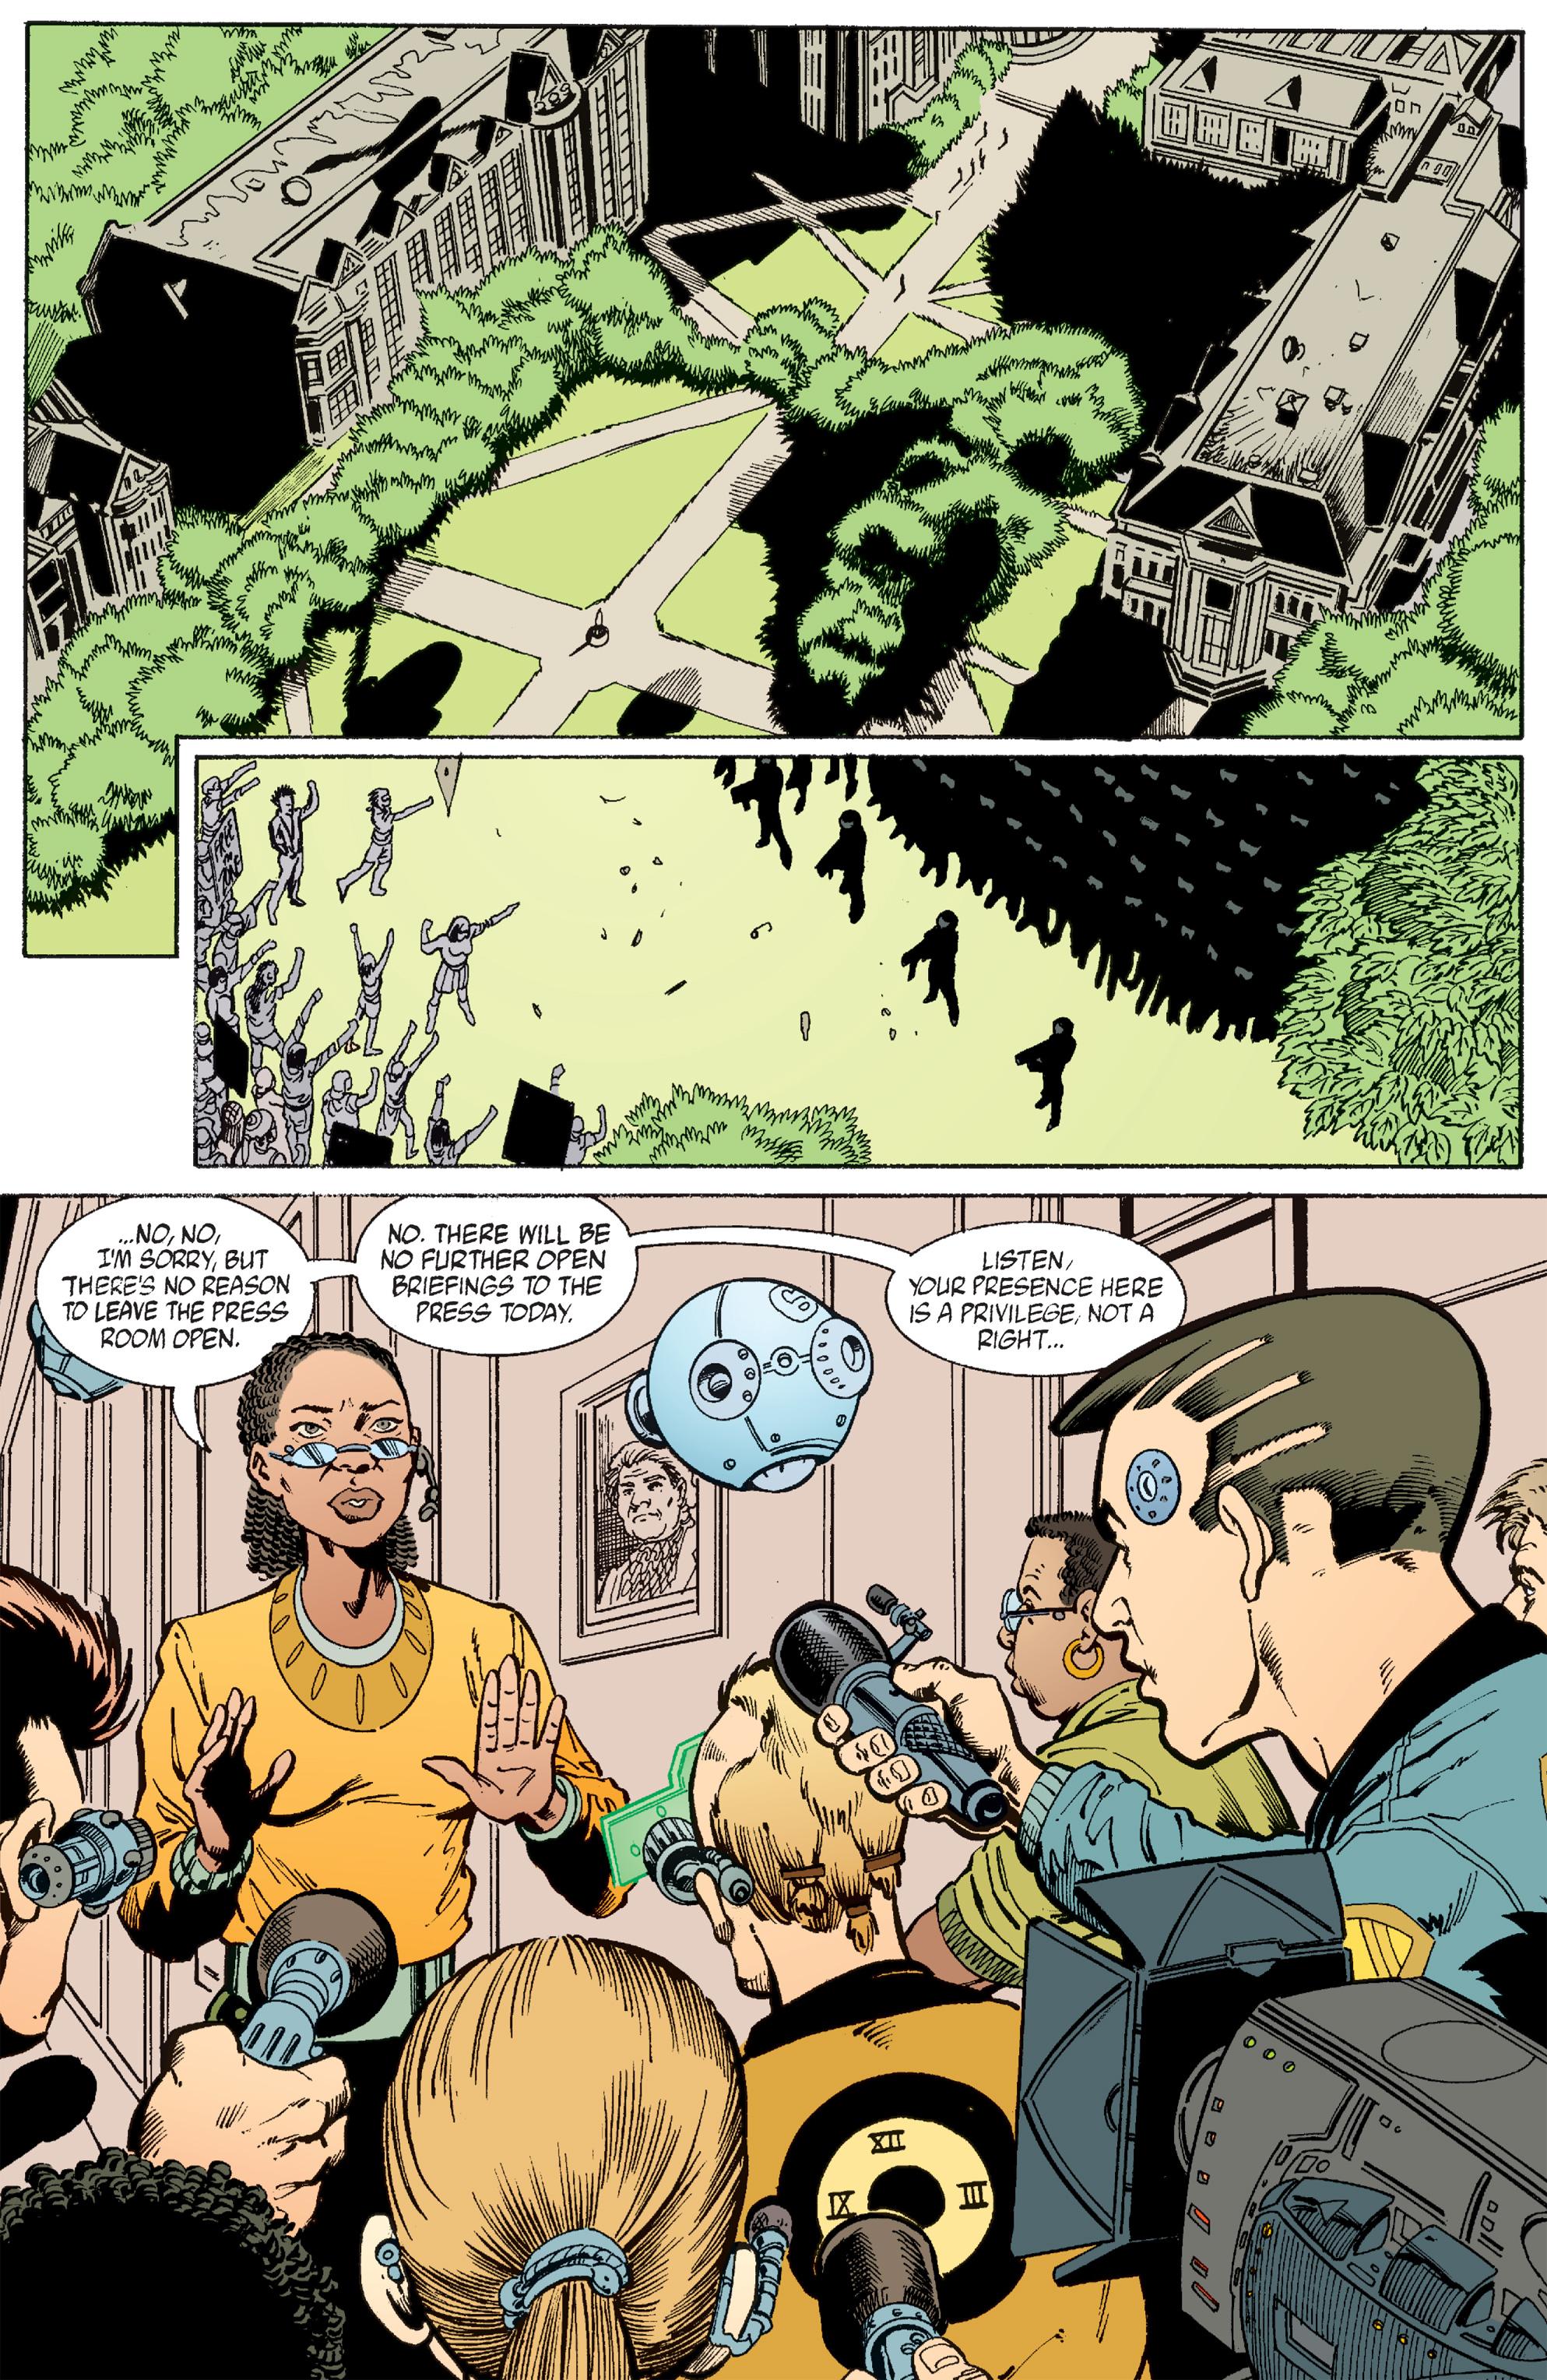 Read online Transmetropolitan comic -  Issue #56 - 17